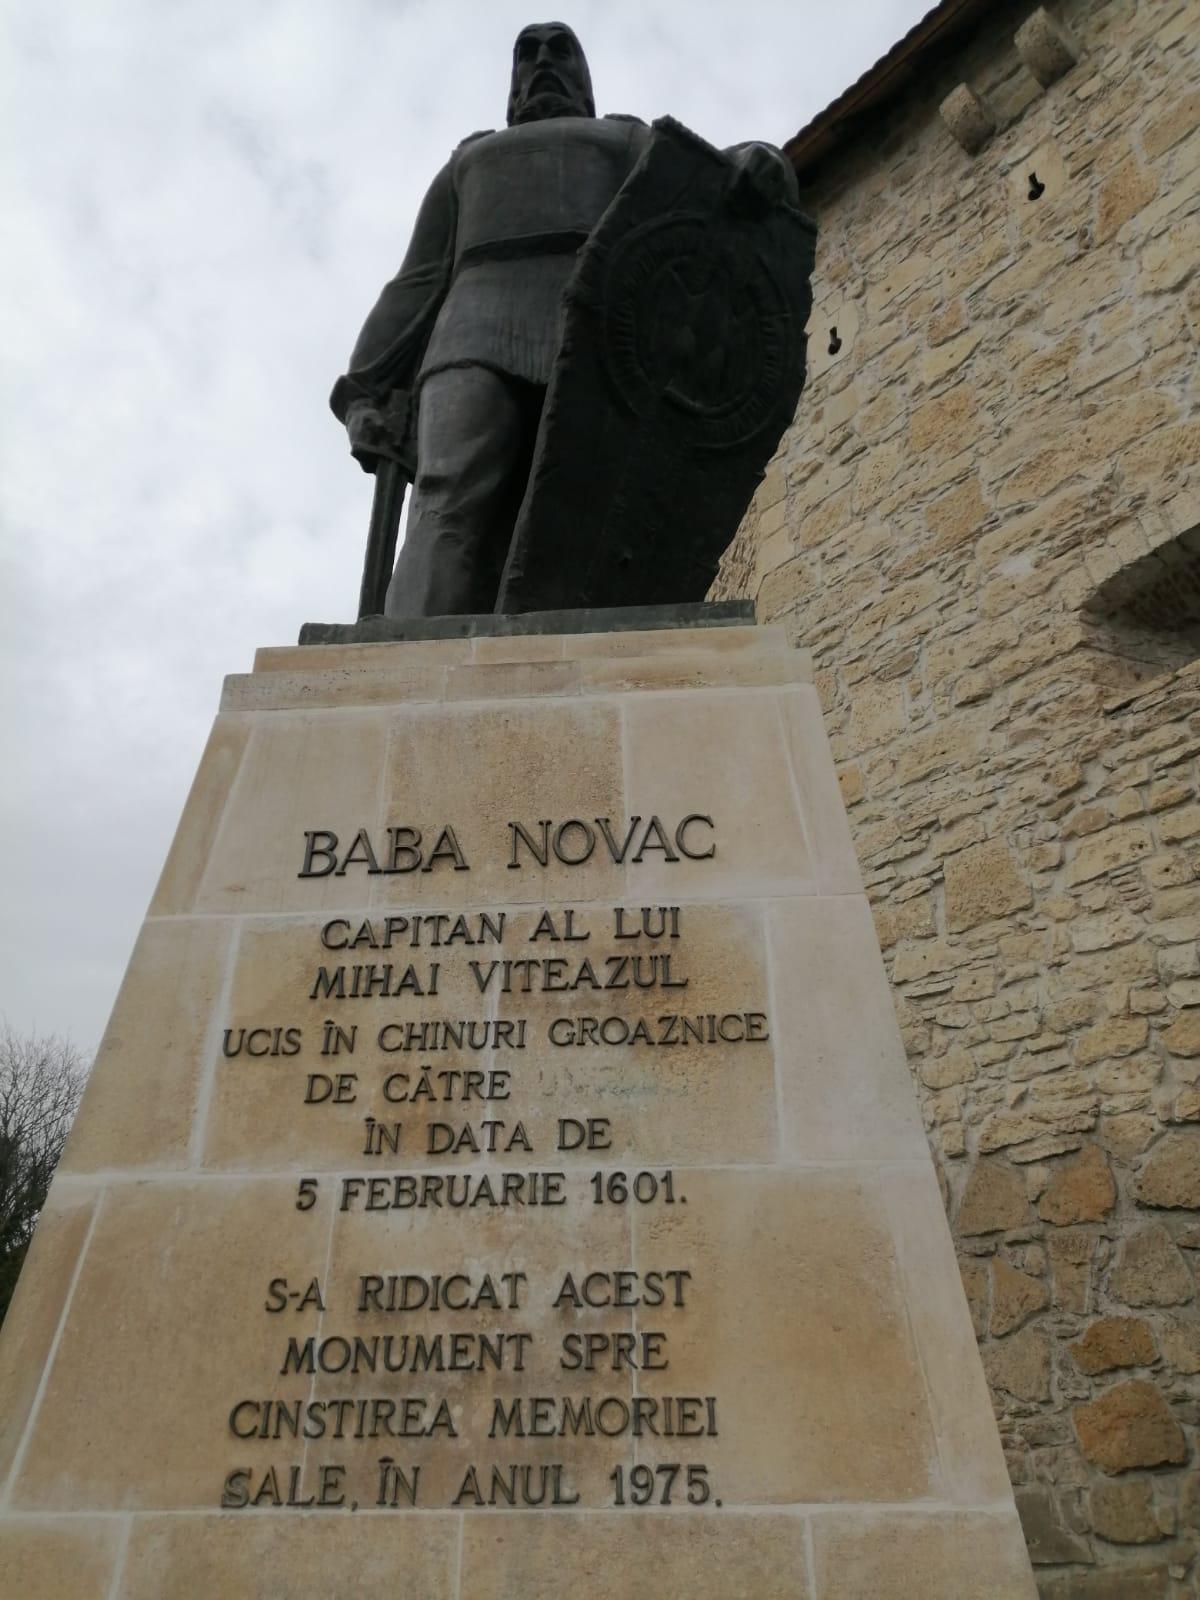 Baba Novac Mihai Viteazul